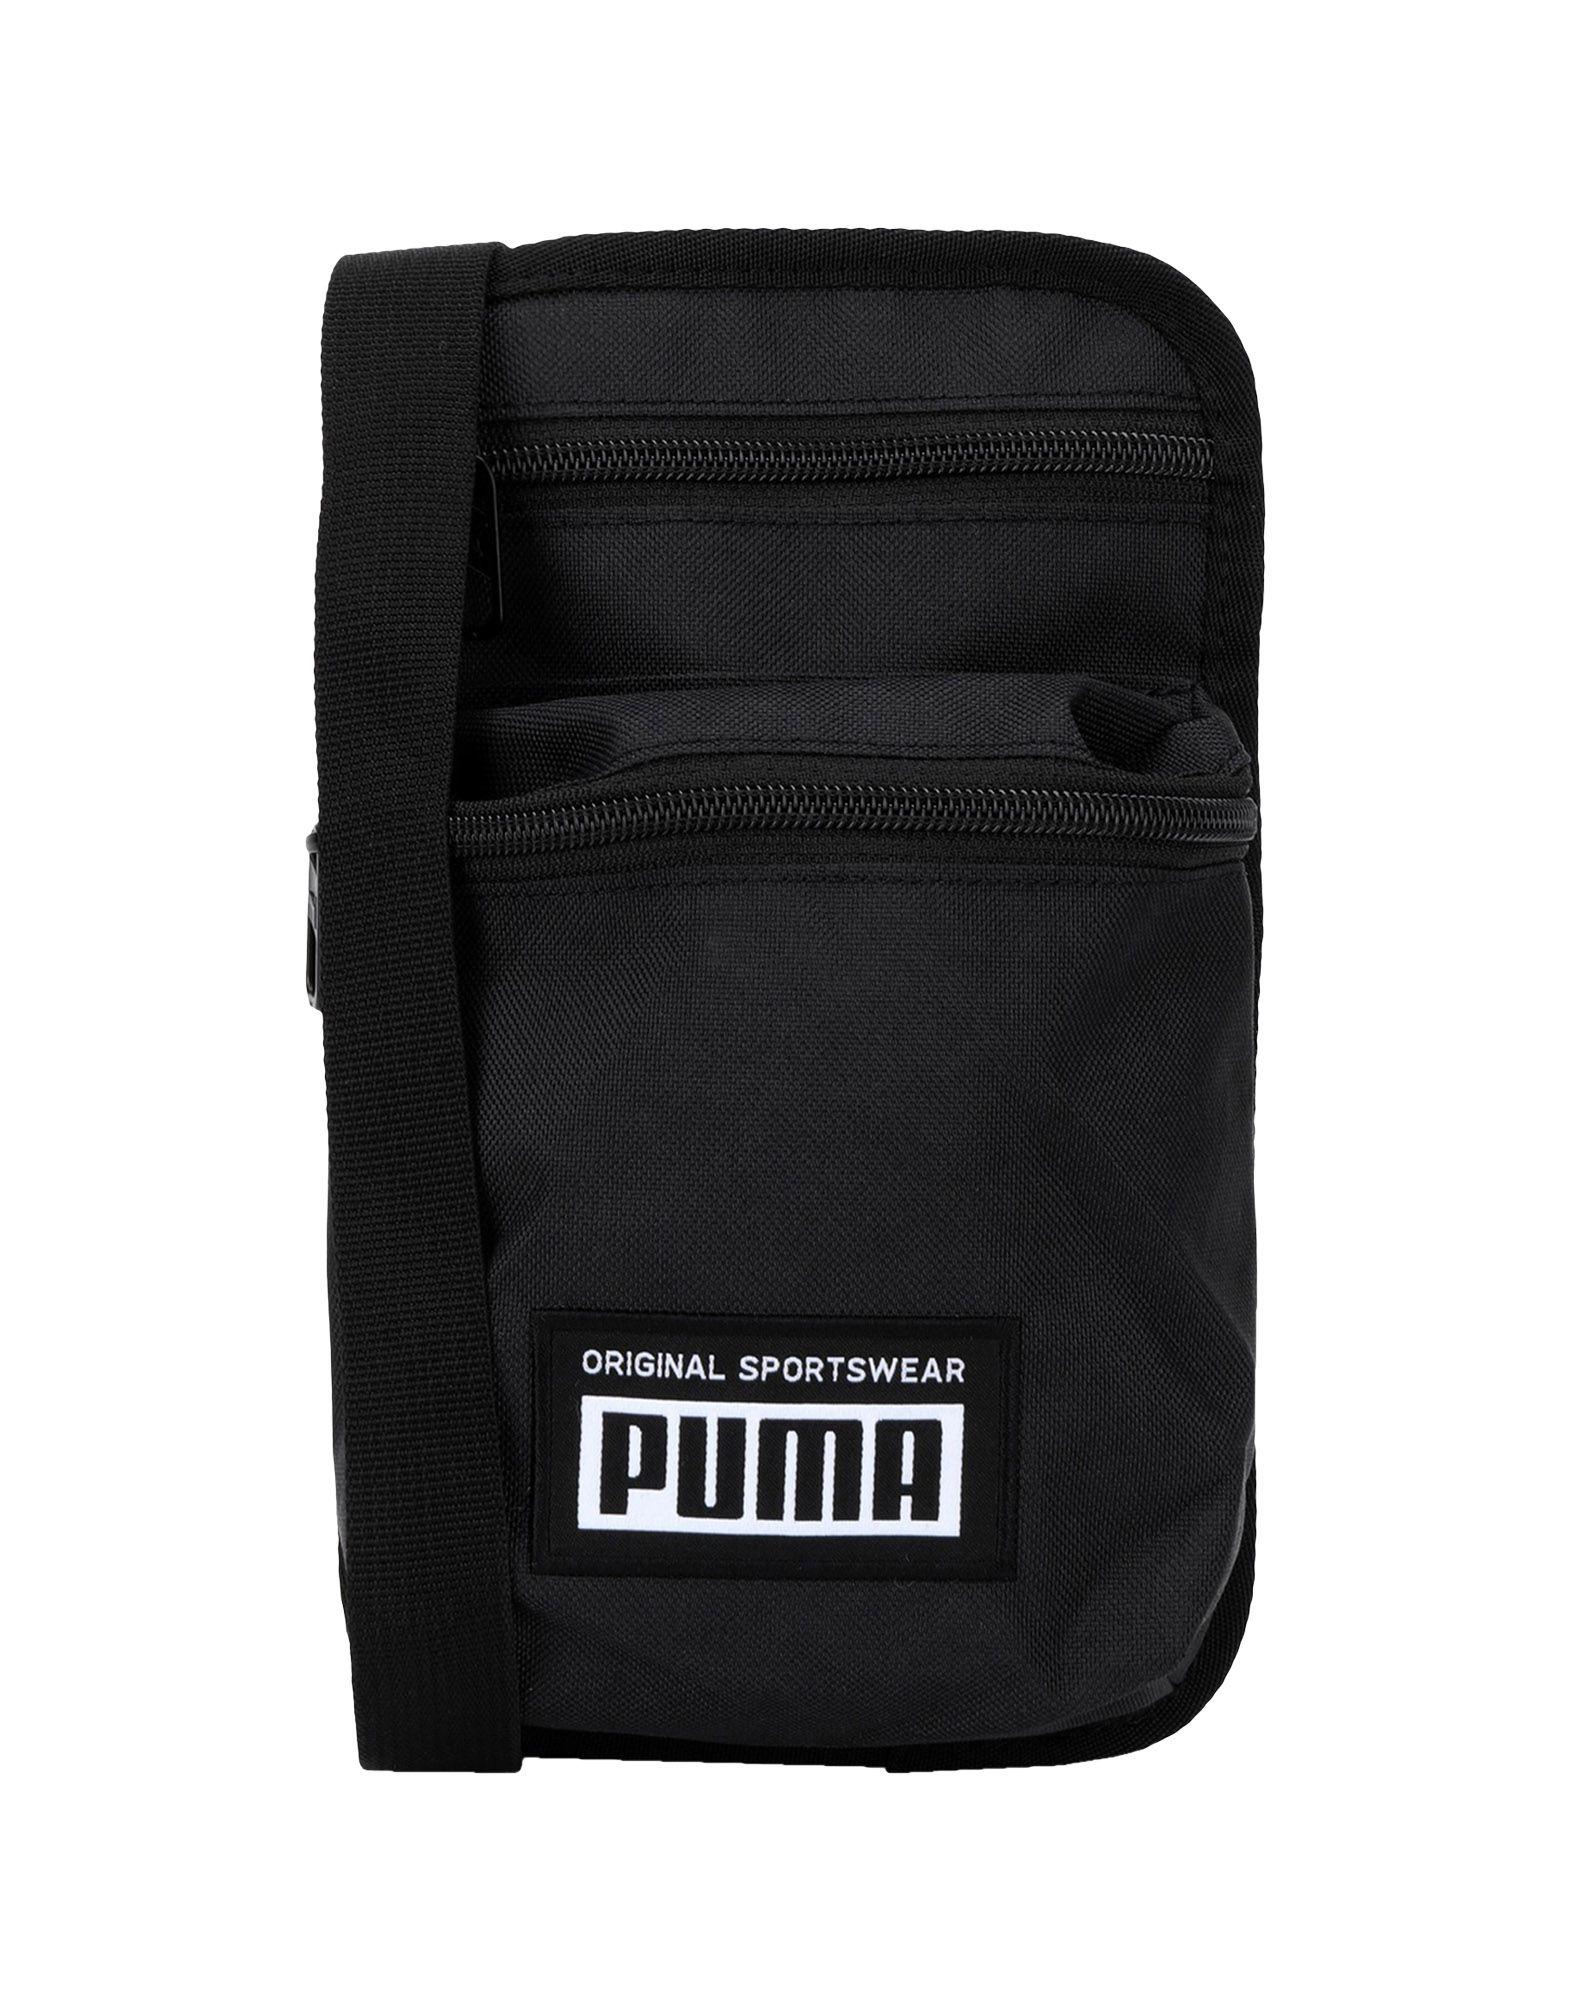 PUMA Сумка через плечо puma сумка puma challenger размер null